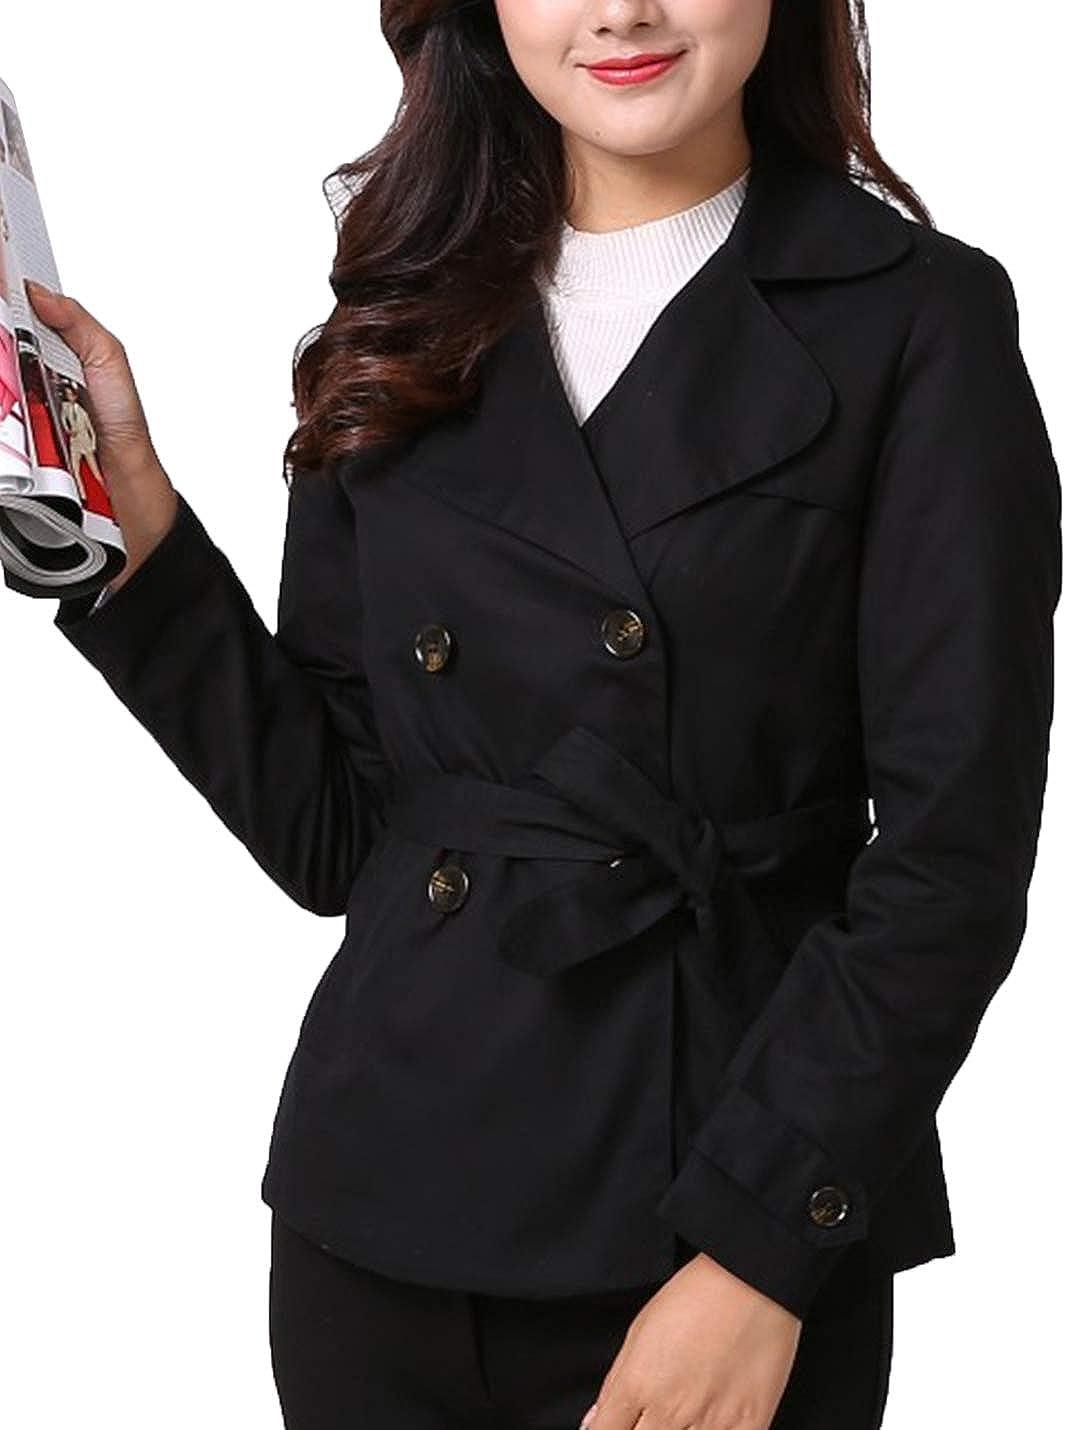 Lentta Womens Cotton Fashion British Fit Sh Slim Max price 61% OFF Double-Breasted